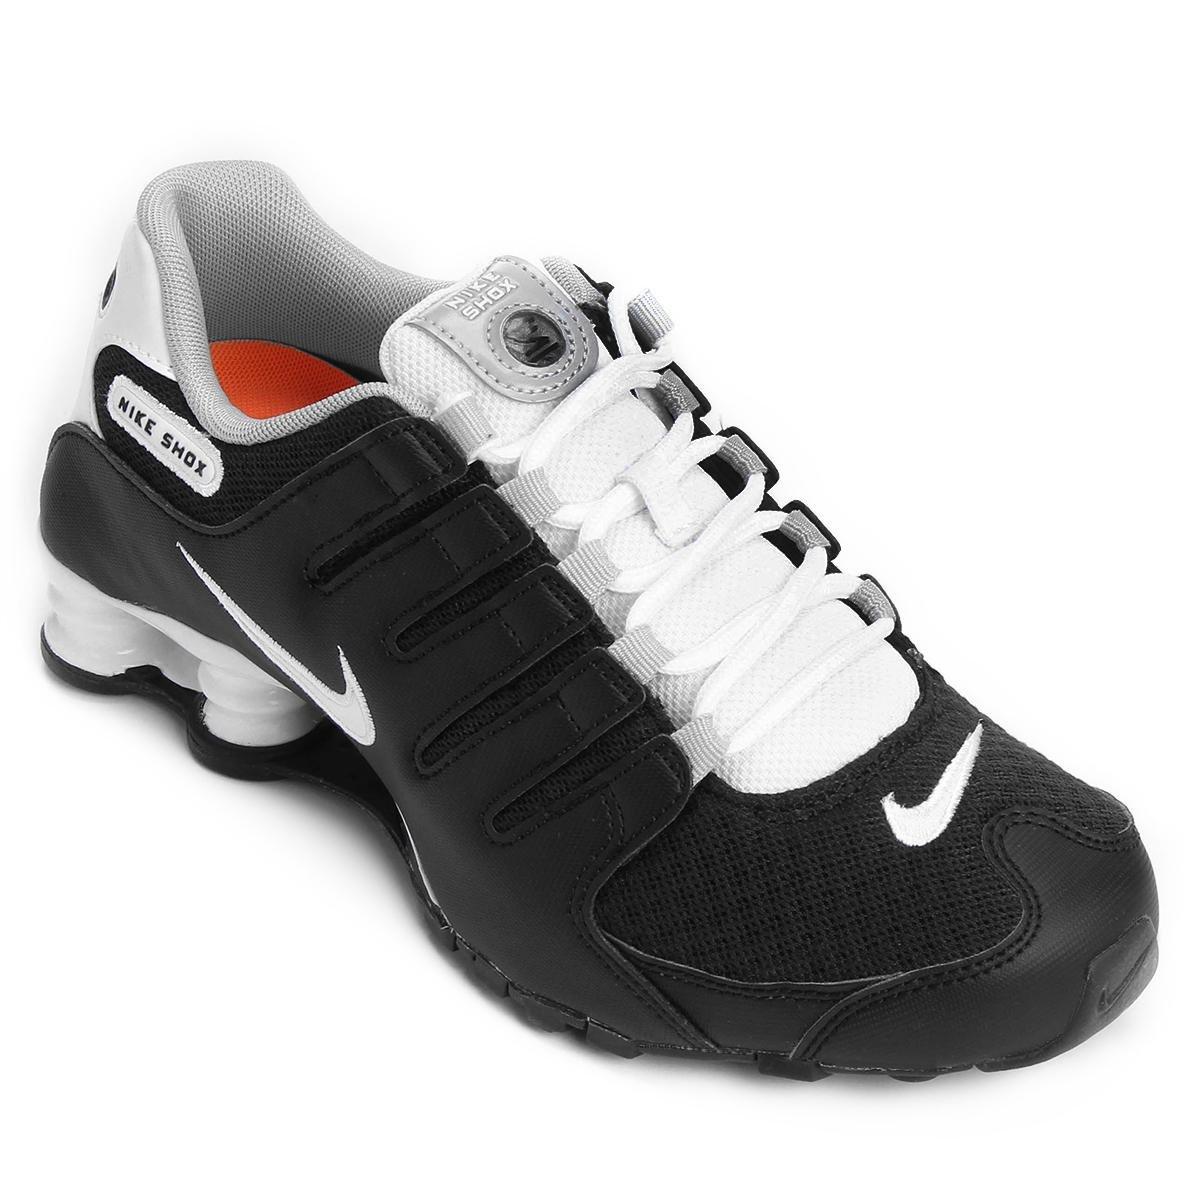 6db03d8abb Tênis Nike Shox Nz Se - Preto e Branco | Loja do Inter